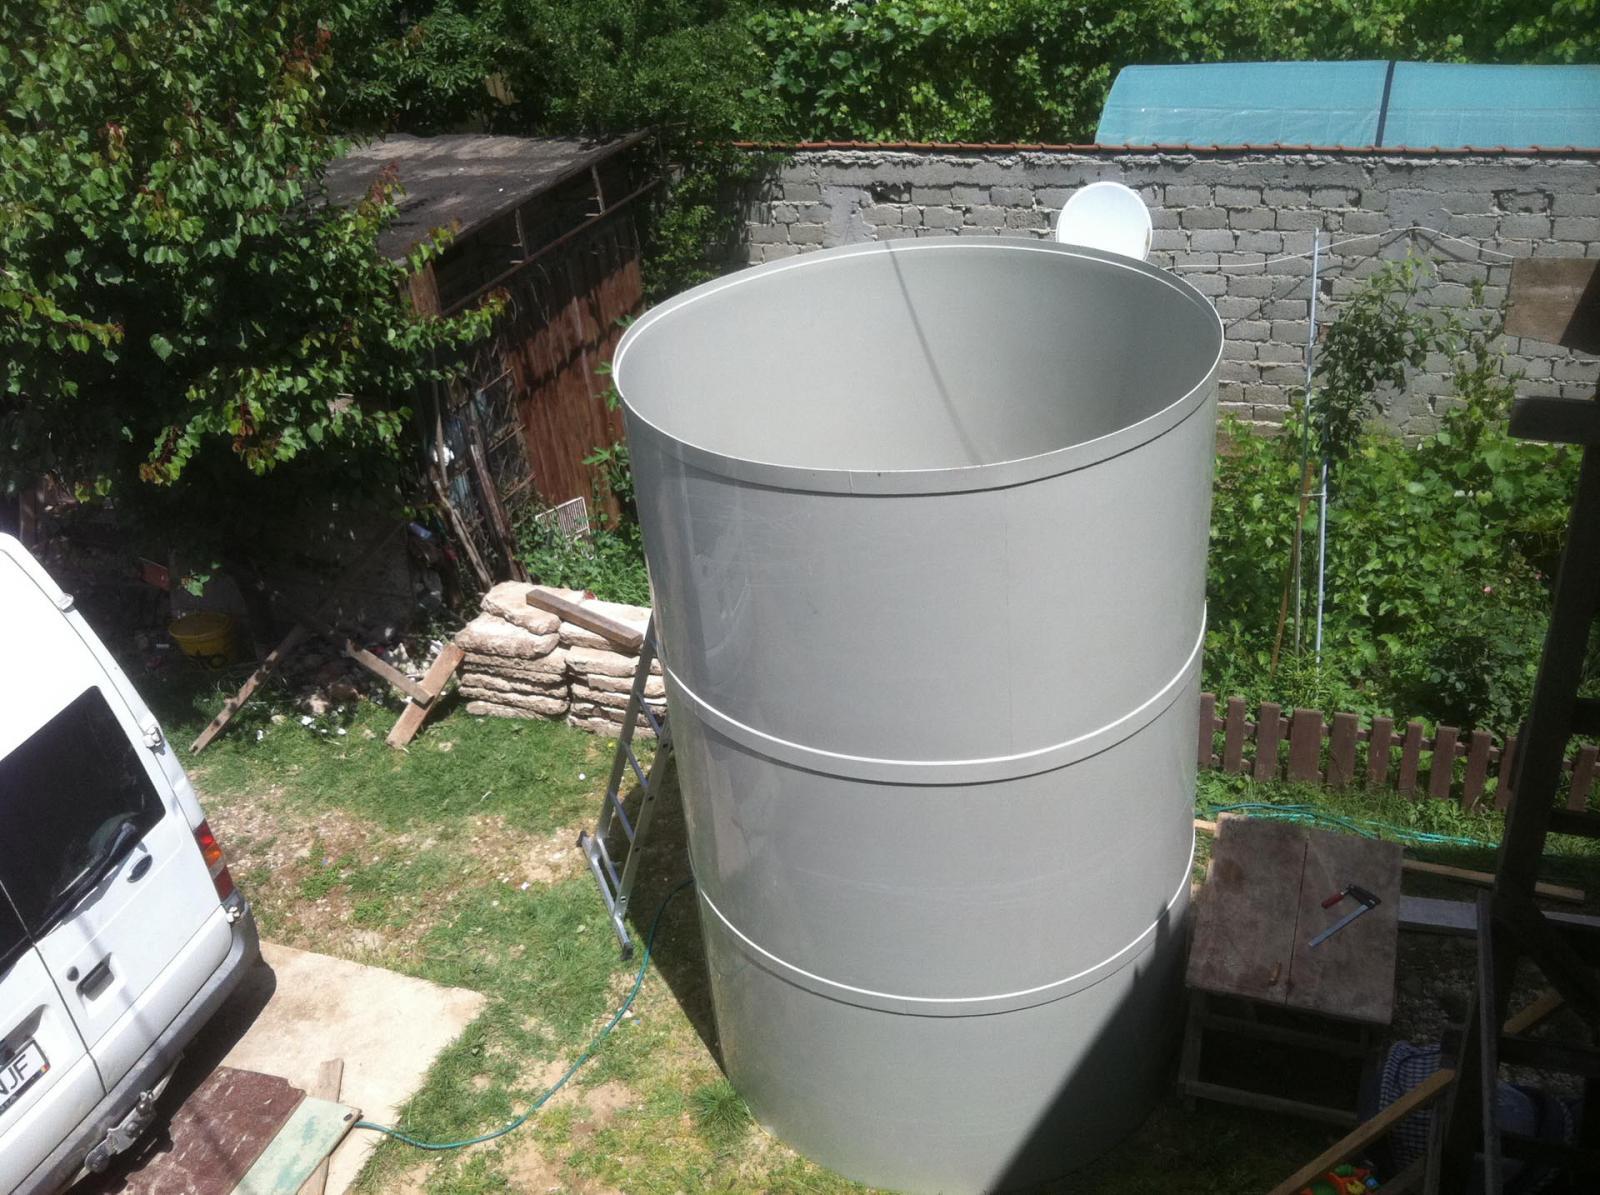 Fose Septice Ecologice Pret Avantajos Eco Plast Galvano Srl